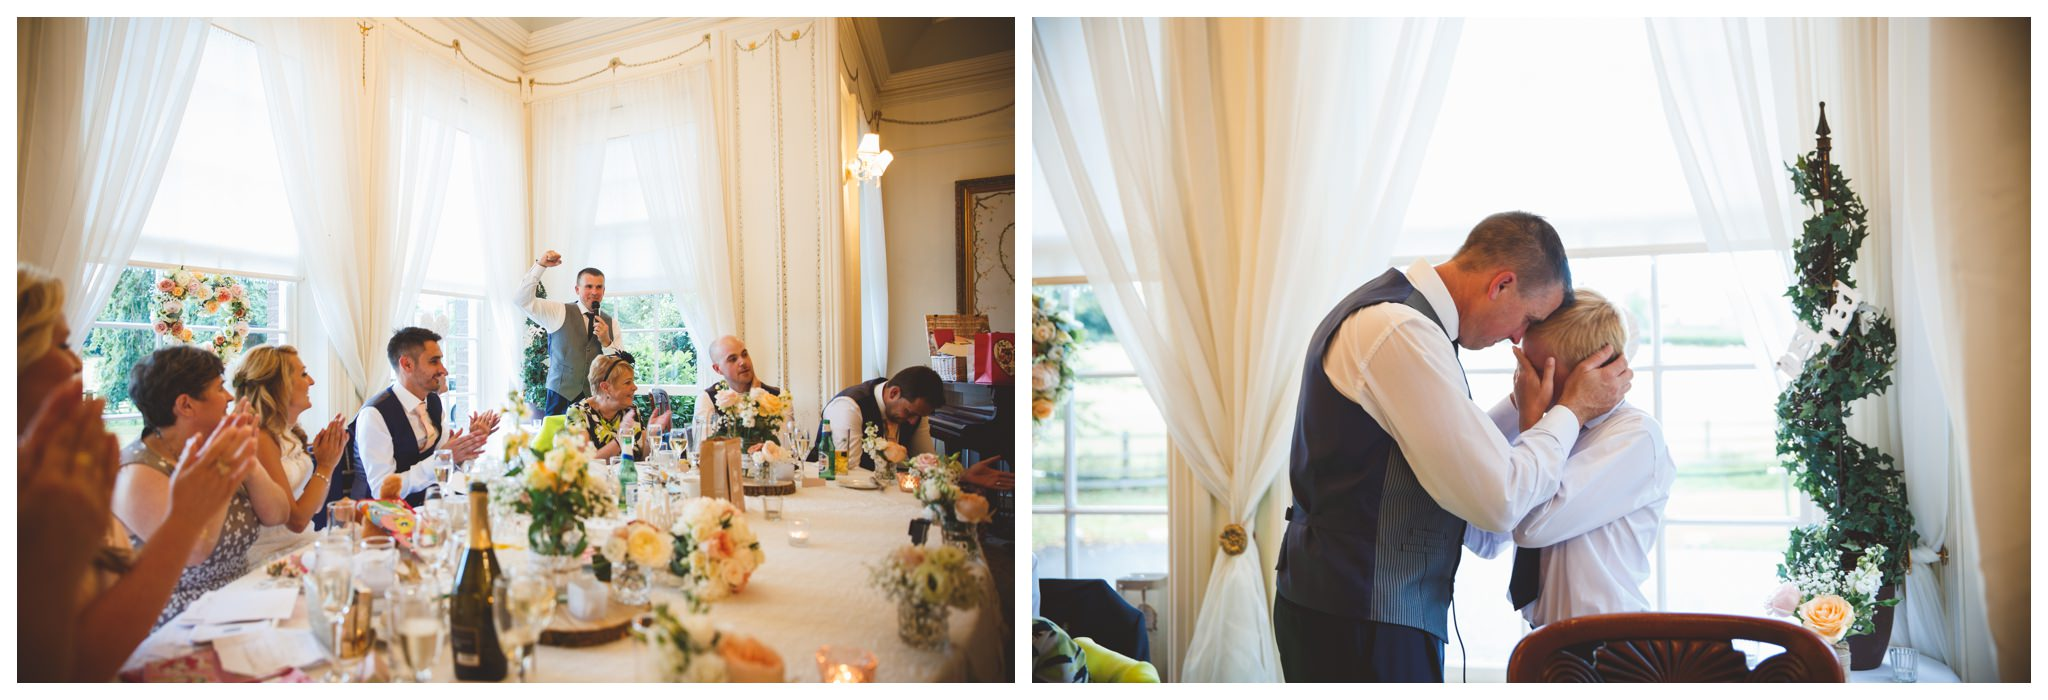 Richard Savage Photography - Wedding - Peterstone Court Brecon - 2016-05-11_0055